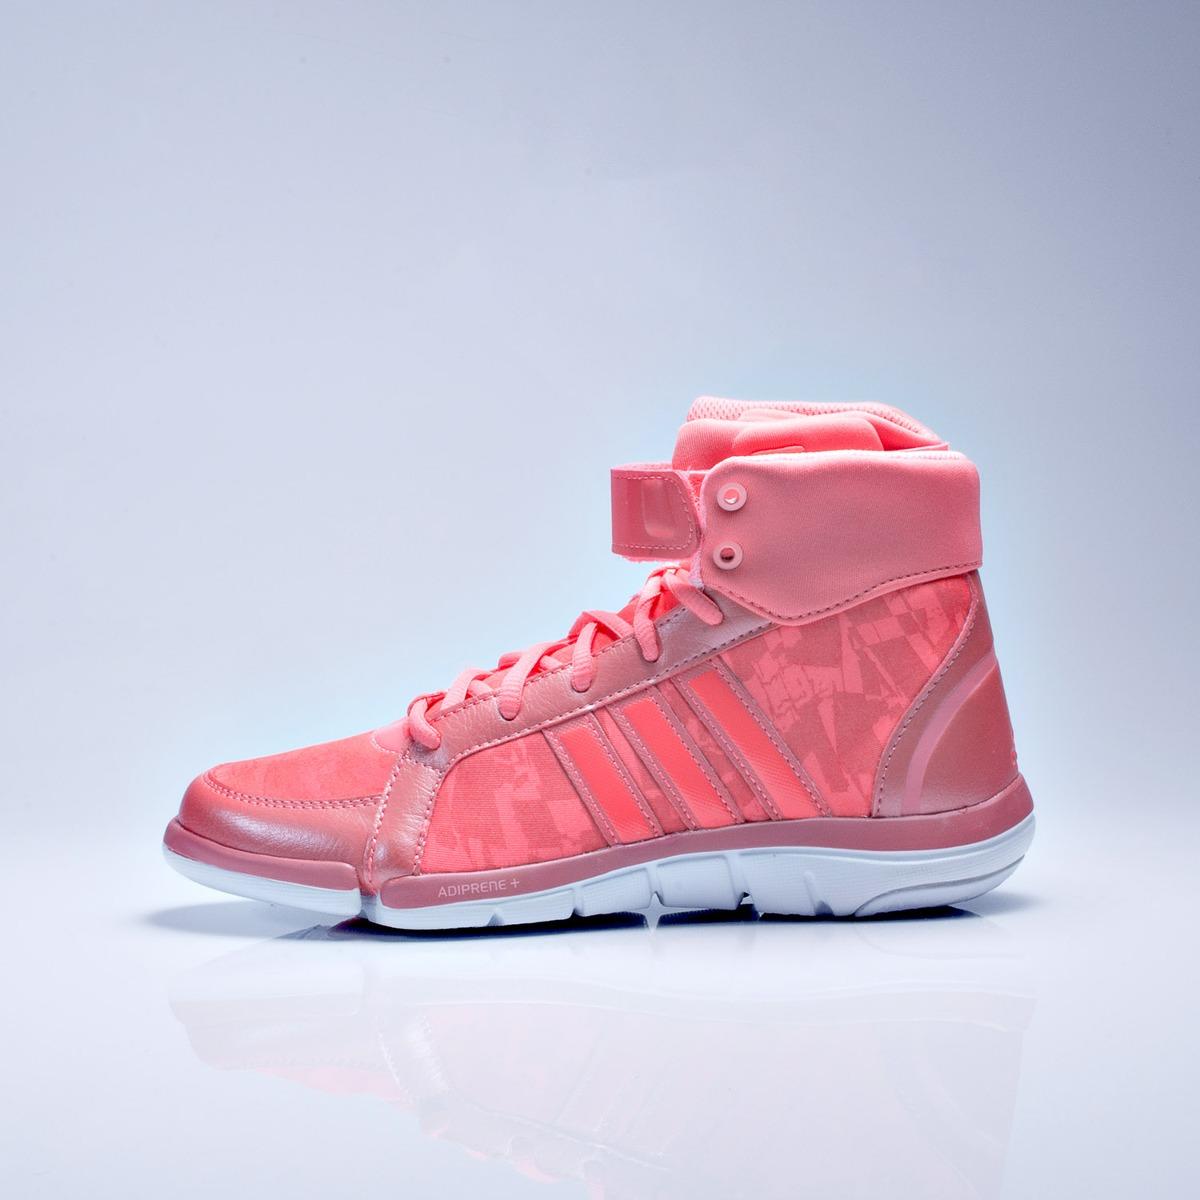 Zapatillas adidas Iriya | Netshoes